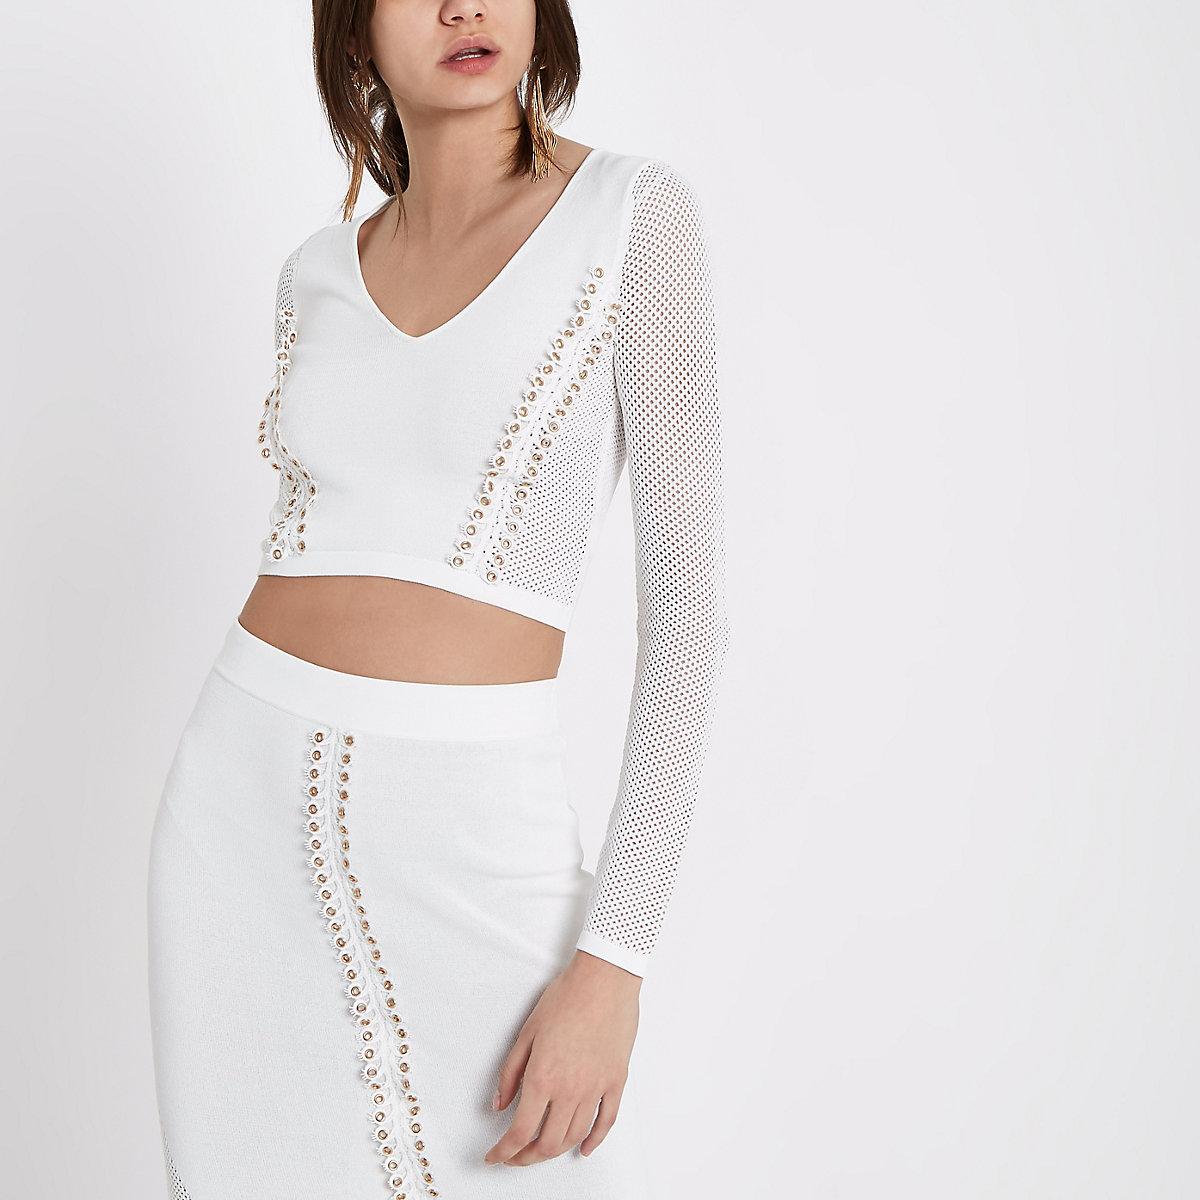 White eyelet pointelle knit V neck crop top